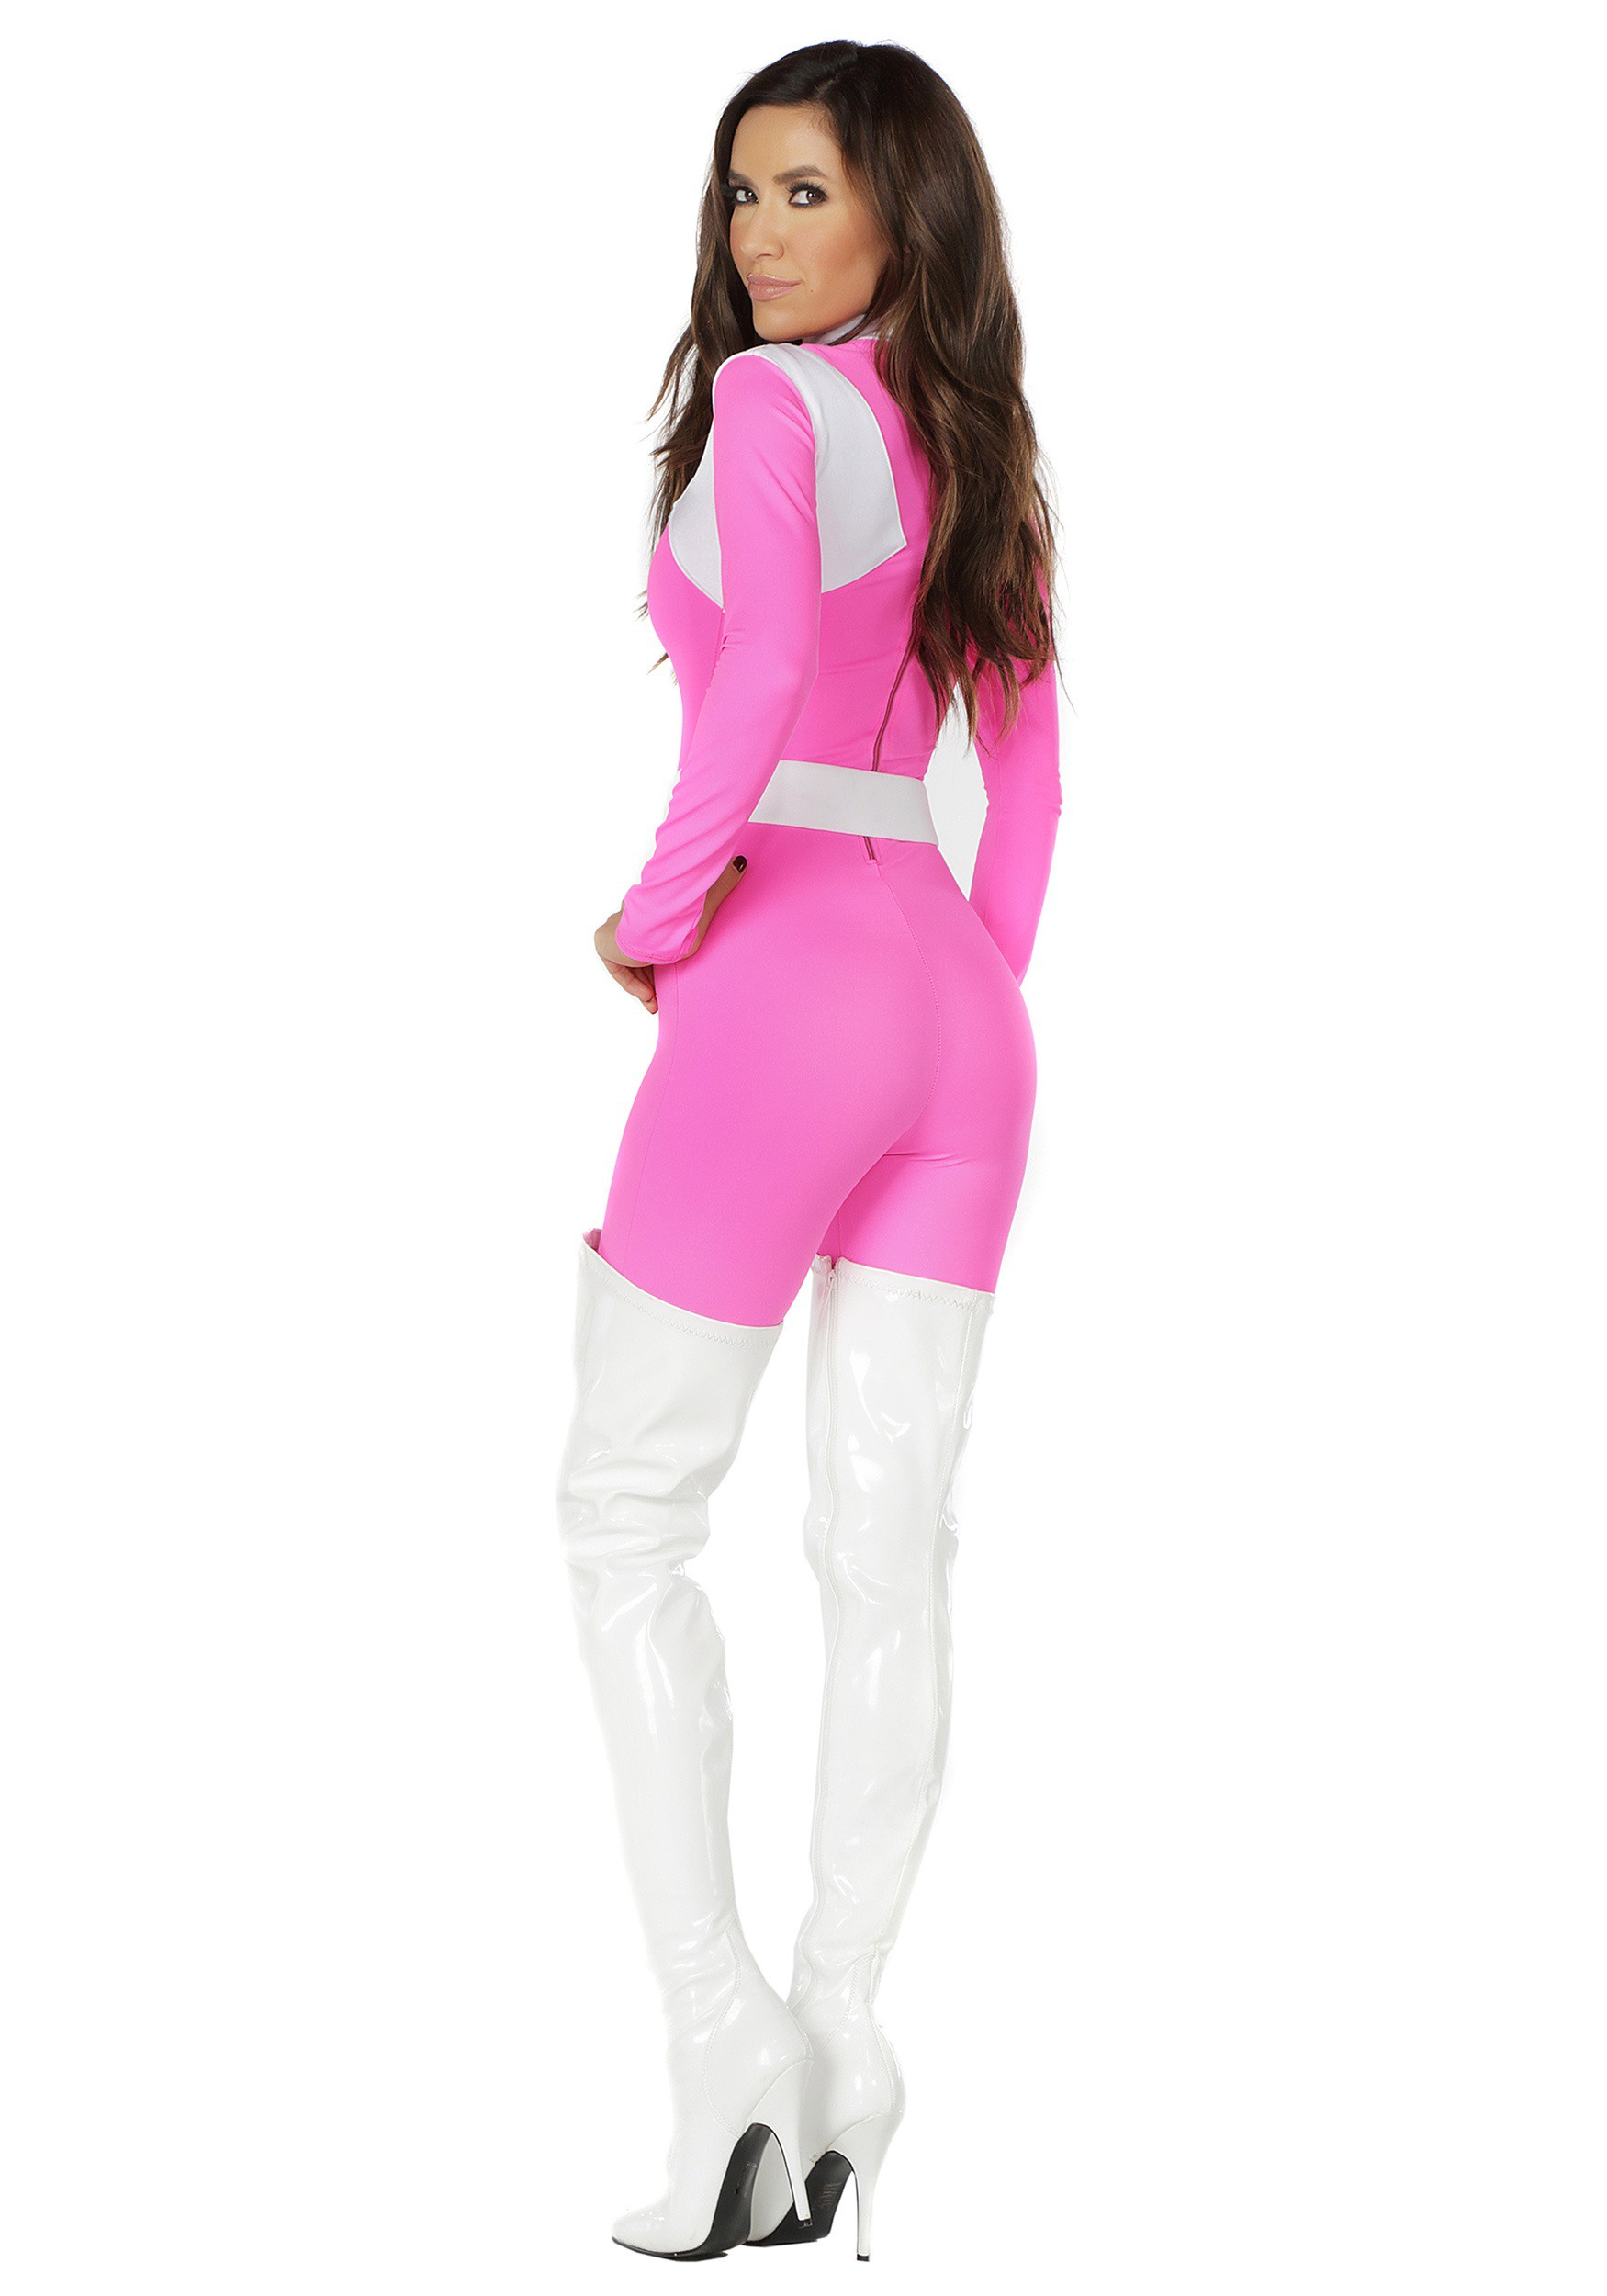 Women S Dominance Action Figure Pink Catsuit